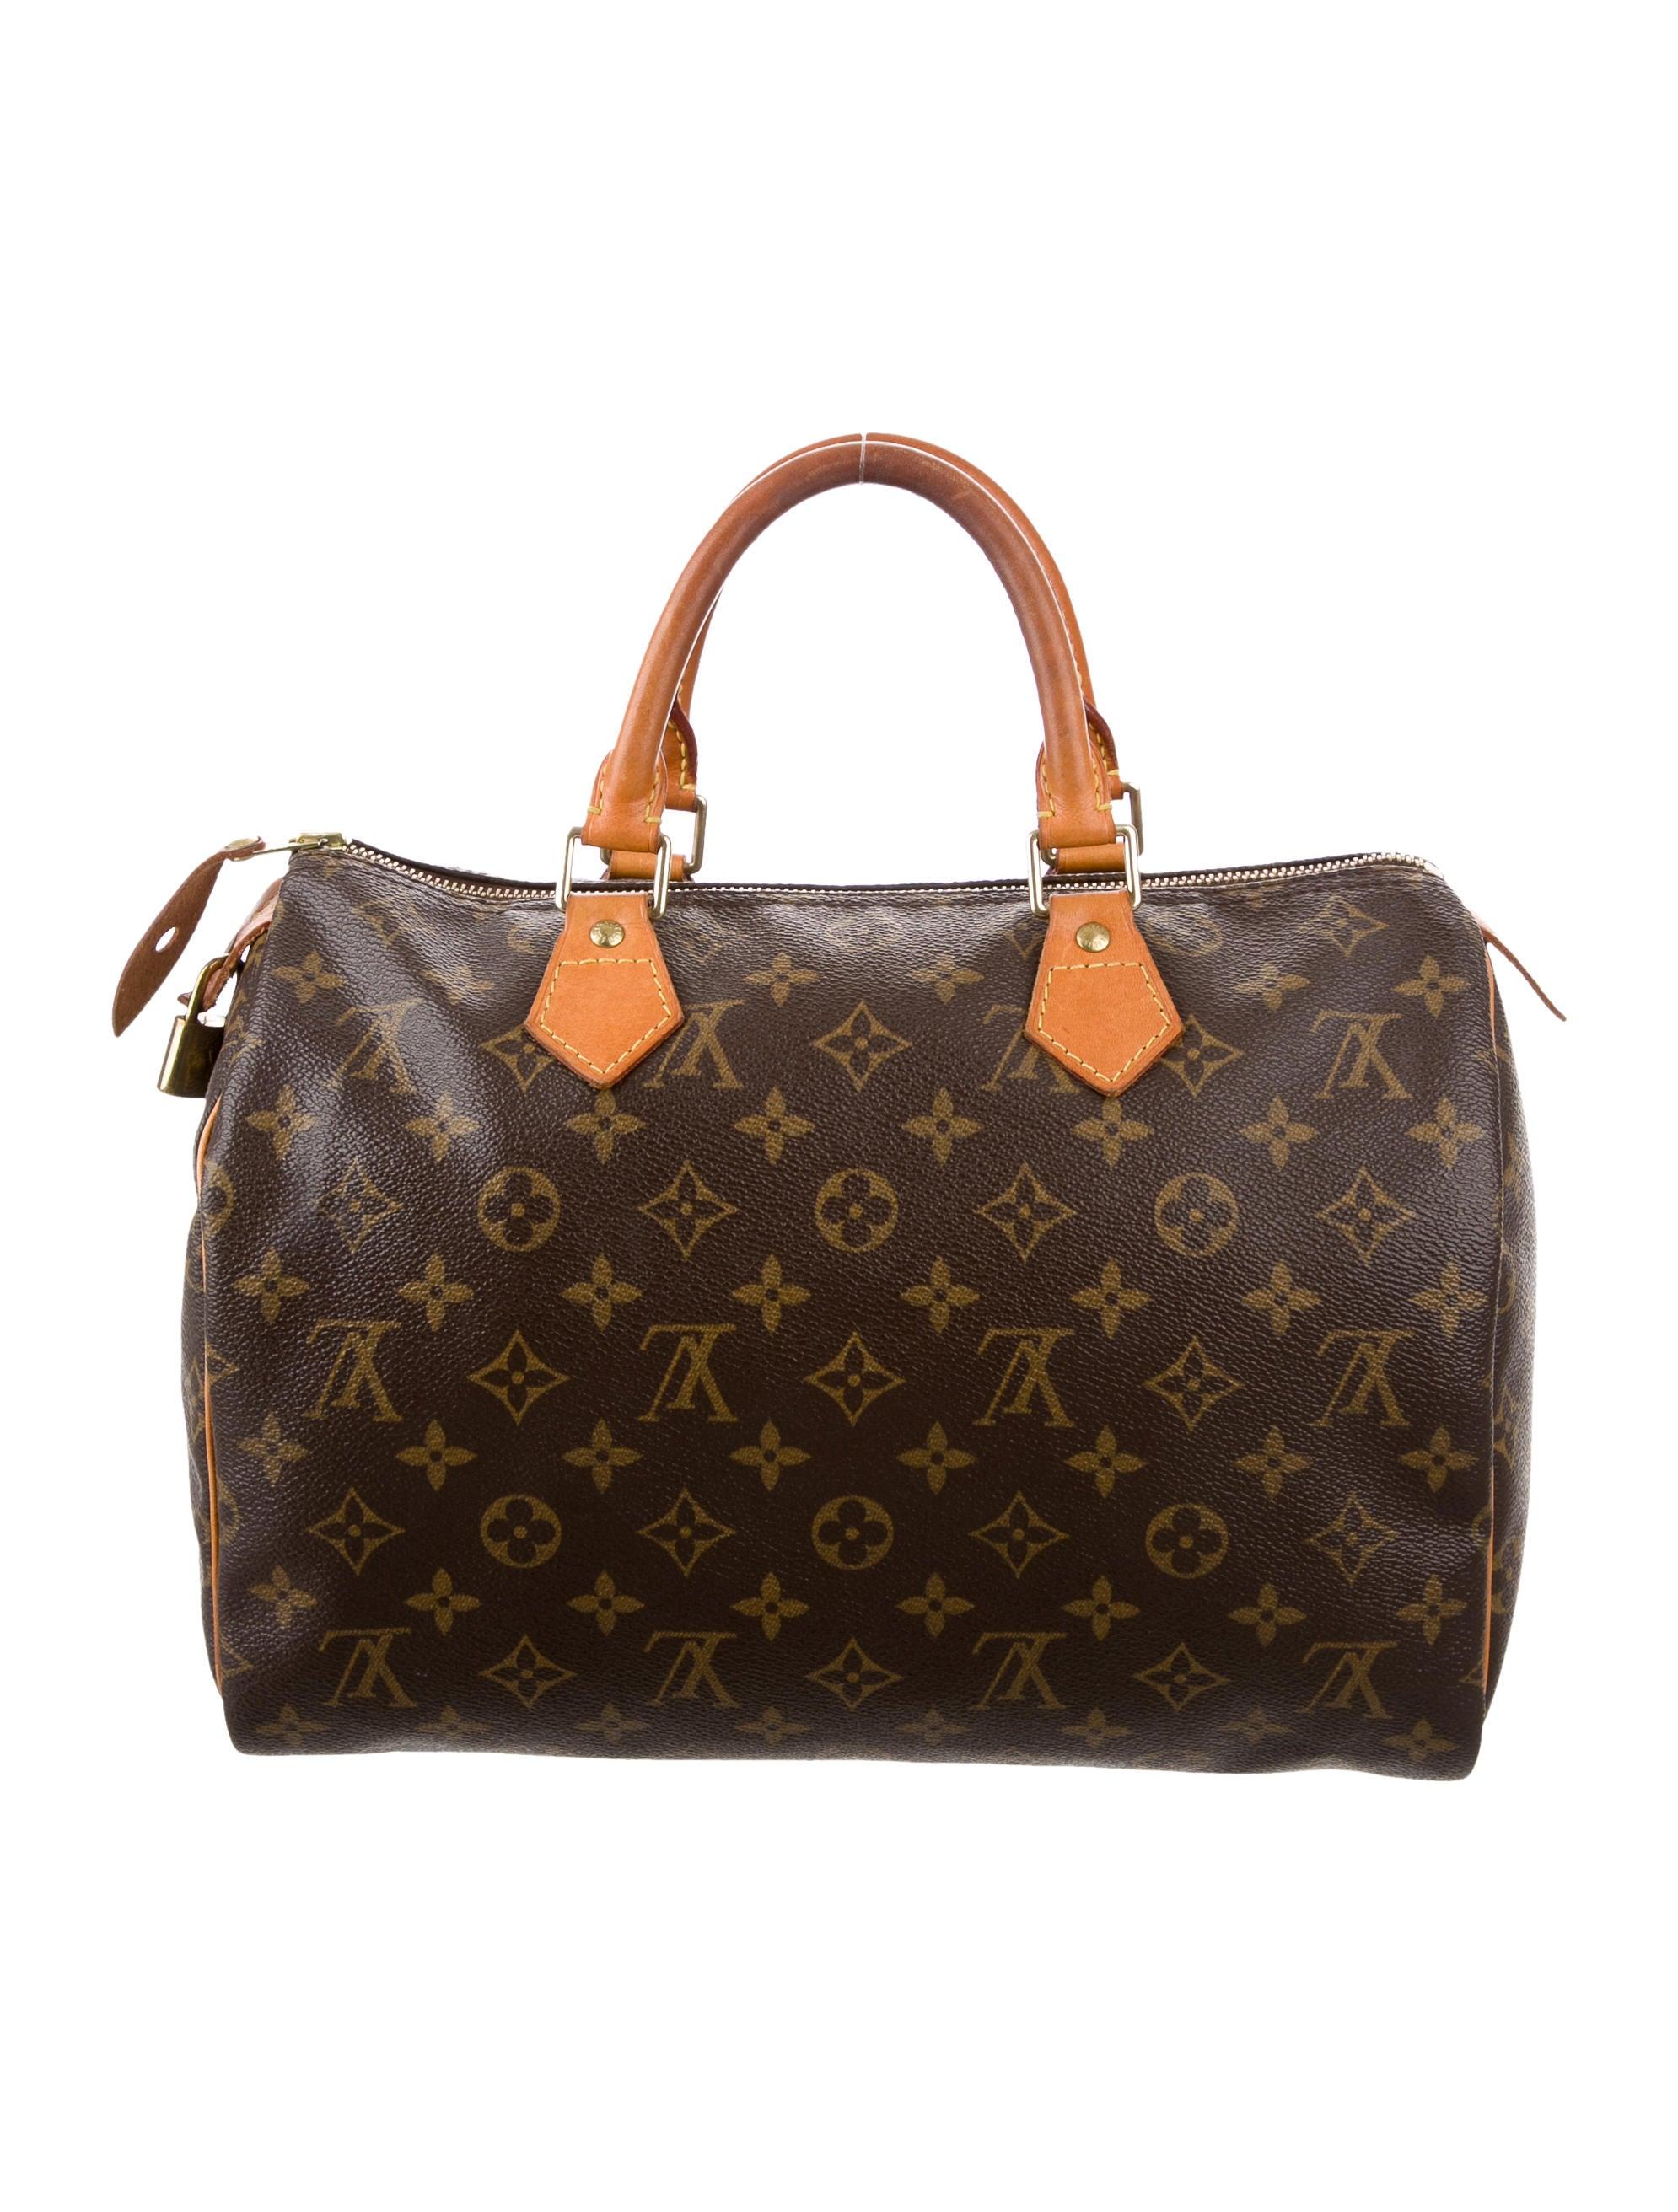 louis vuitton monogram speedy 30 handbags lou121696. Black Bedroom Furniture Sets. Home Design Ideas